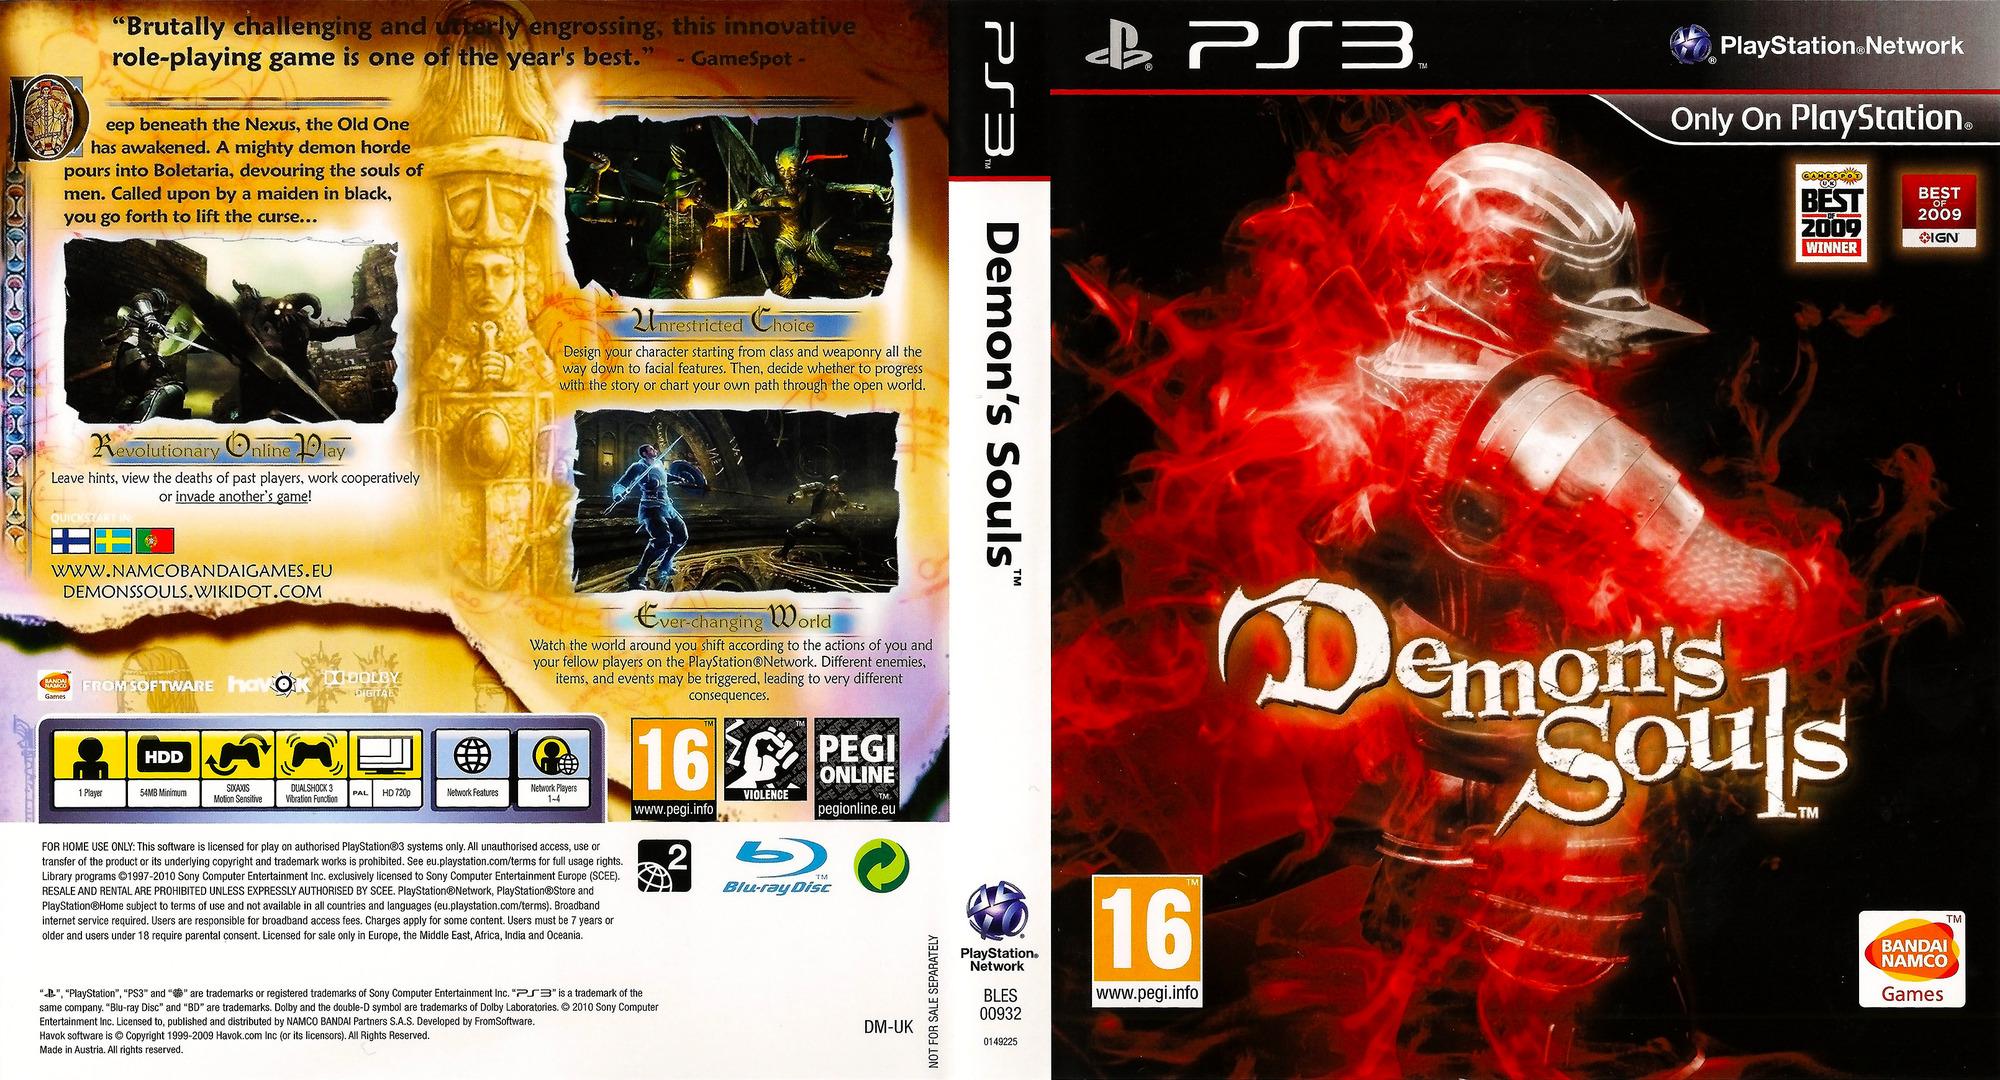 BLES00932 Demons Souls